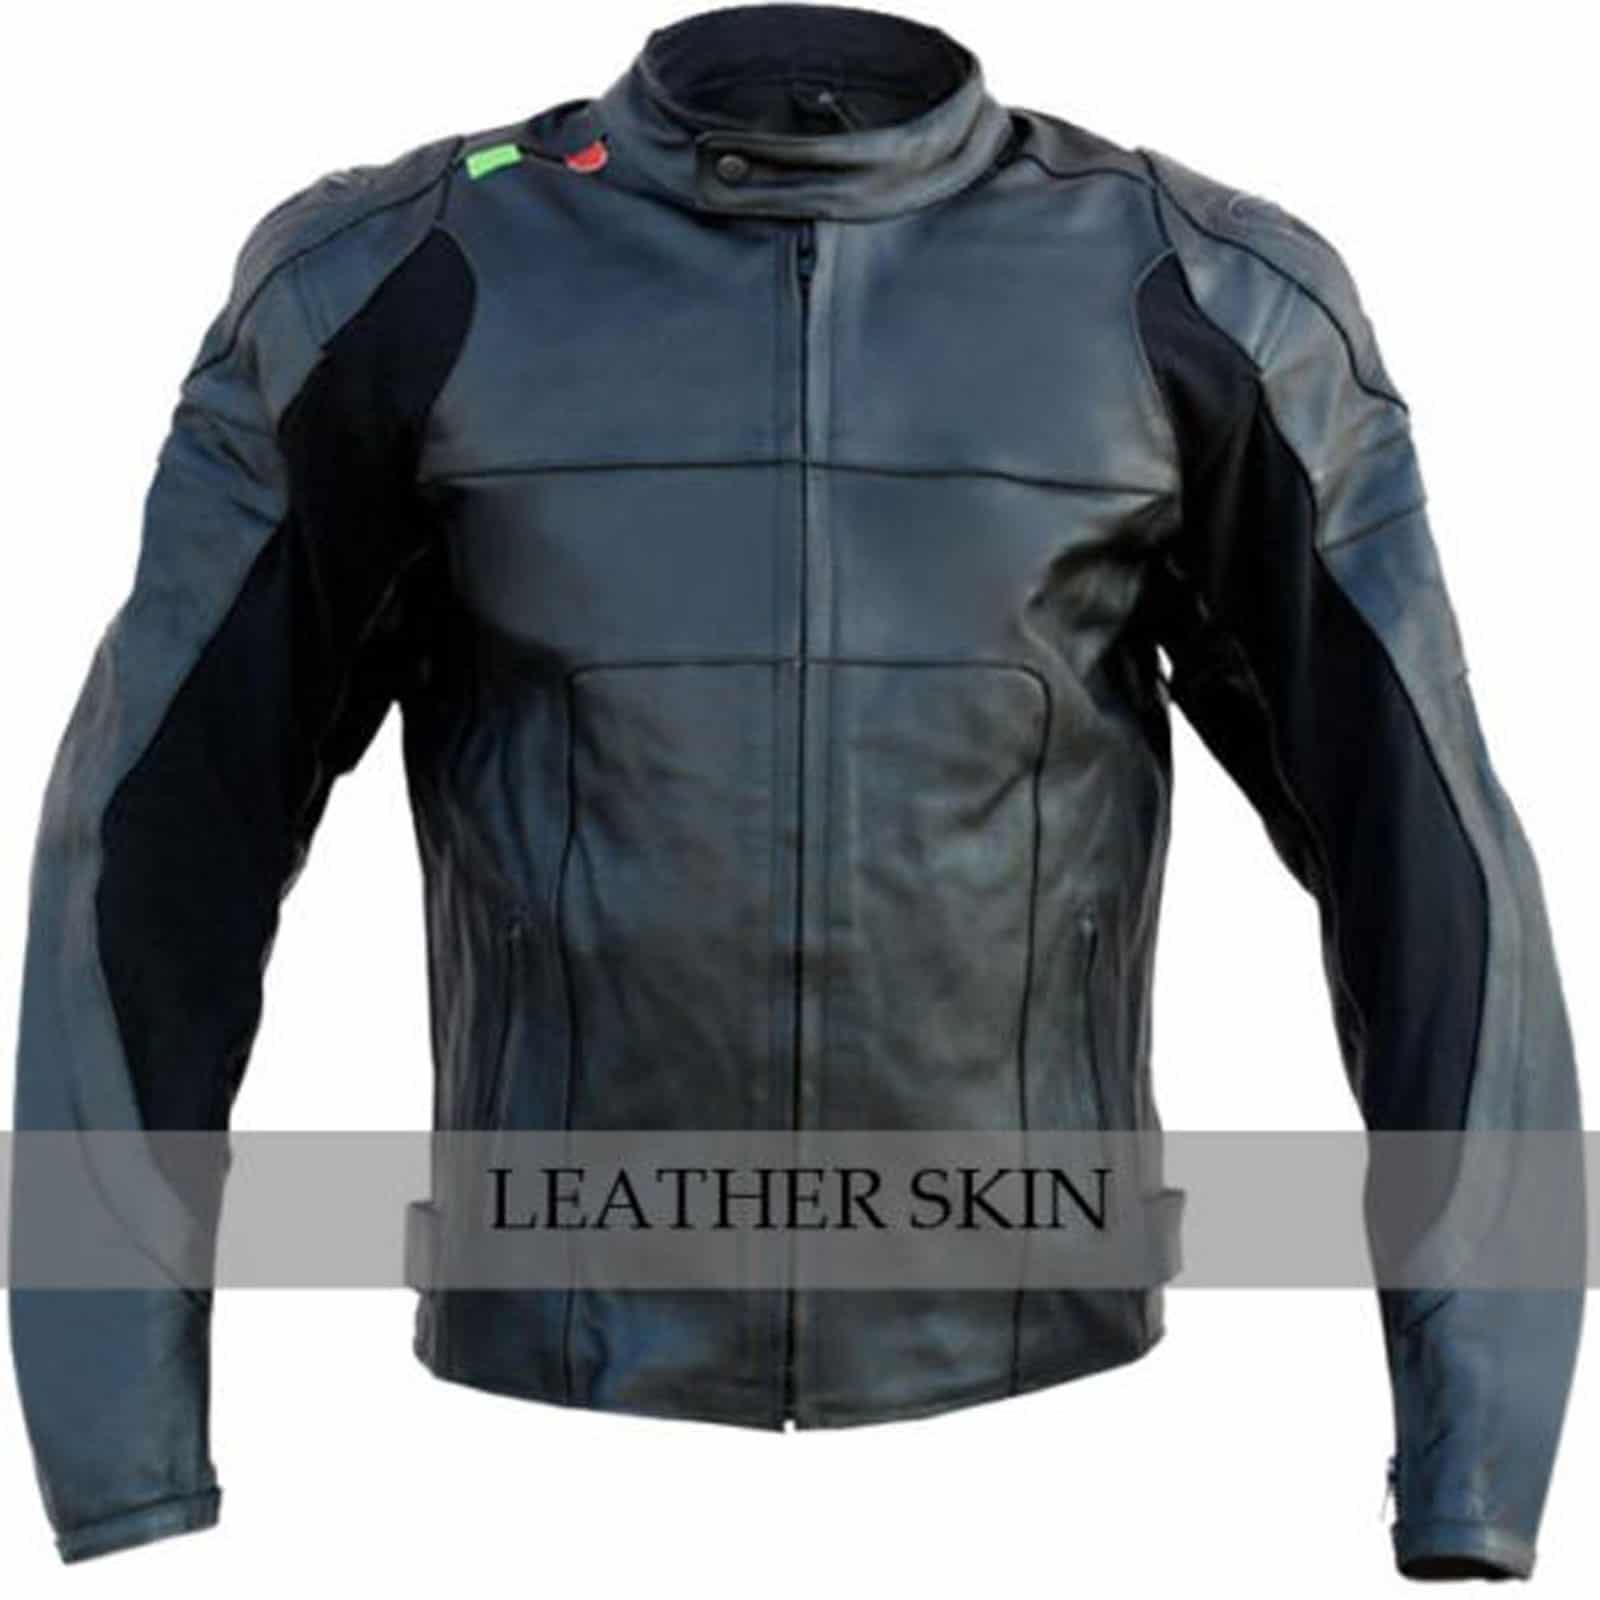 Leather jacket bike